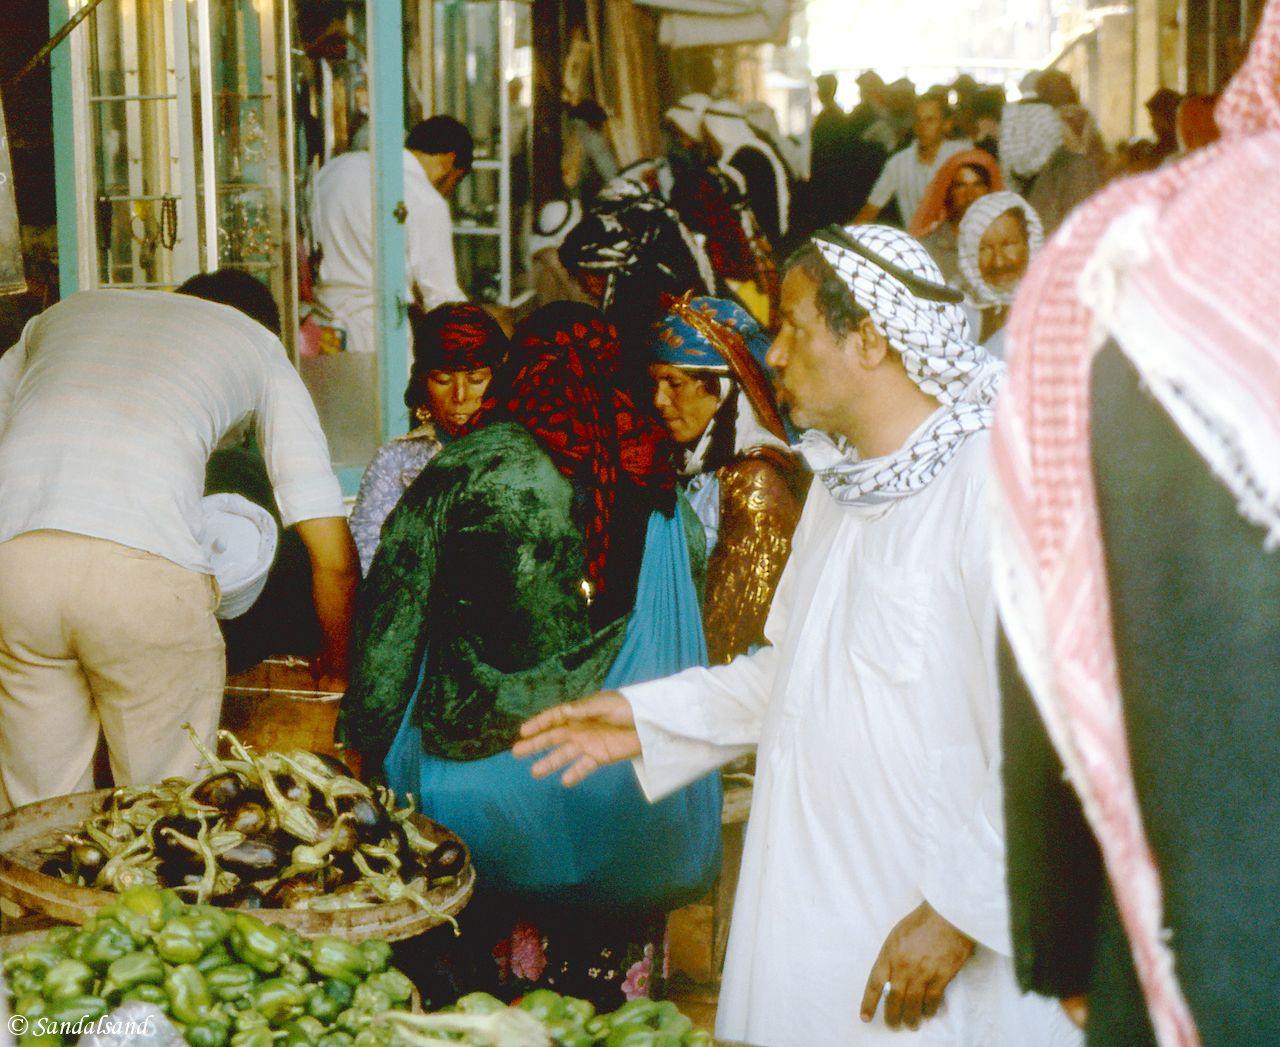 Syria - Deir-es-Zor - Market street